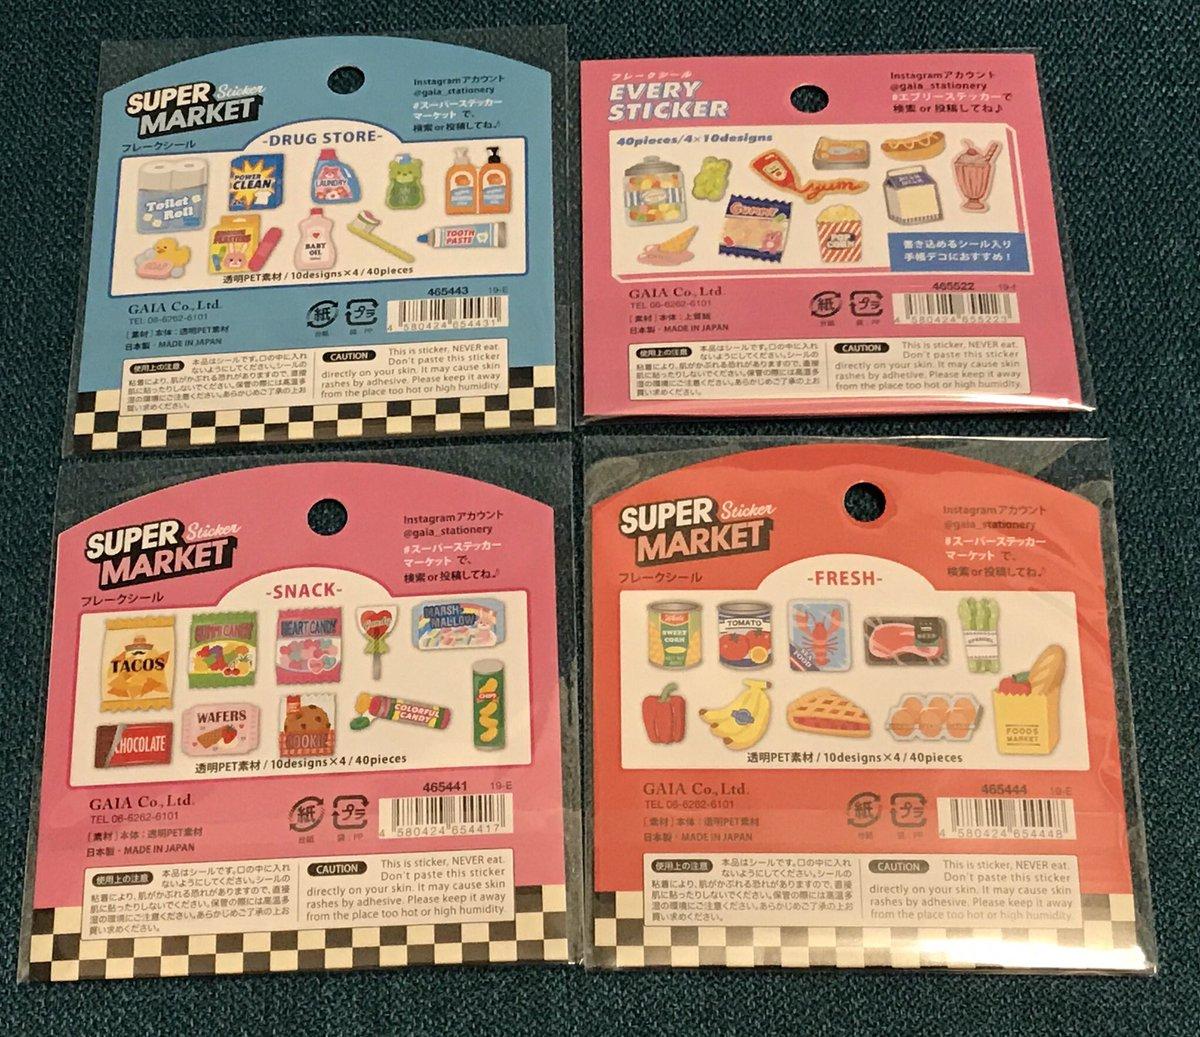 test ツイッターメディア - お次はキャンドゥ!  うん!いいじゃない! レトロ食堂シリーズの欲しいやつGET٩( 'ω' )و  クリームソーダの小皿かわいい✨  ちょっと買いすぎたかな💦  スーパーマーケットのフレークシールもいい感じ! これだけでおままごとできるなぁ…  #100円ショップ  #キャンドゥ https://t.co/cqWV8ZV7aH